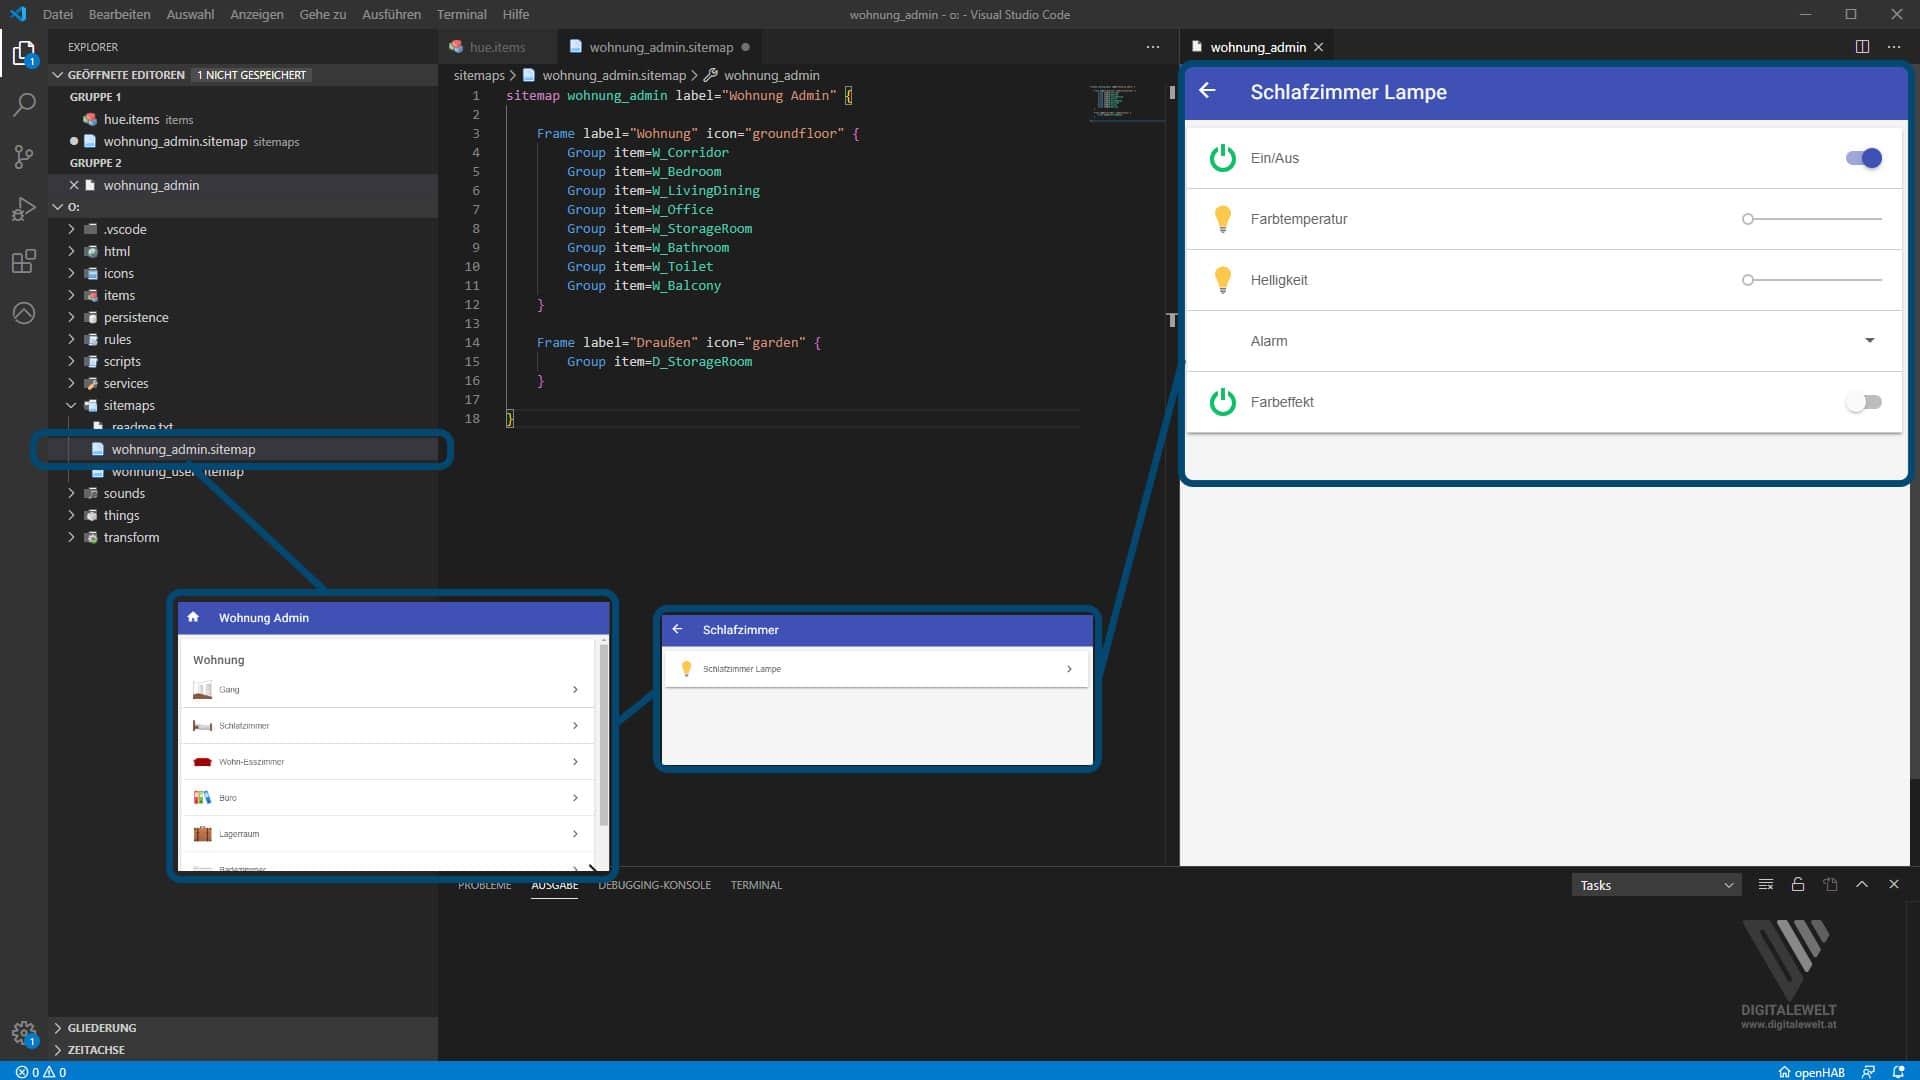 OpenHAB 2 Philips HUE Binding Teil1 – Admin Sitemap – digitalewelt.at